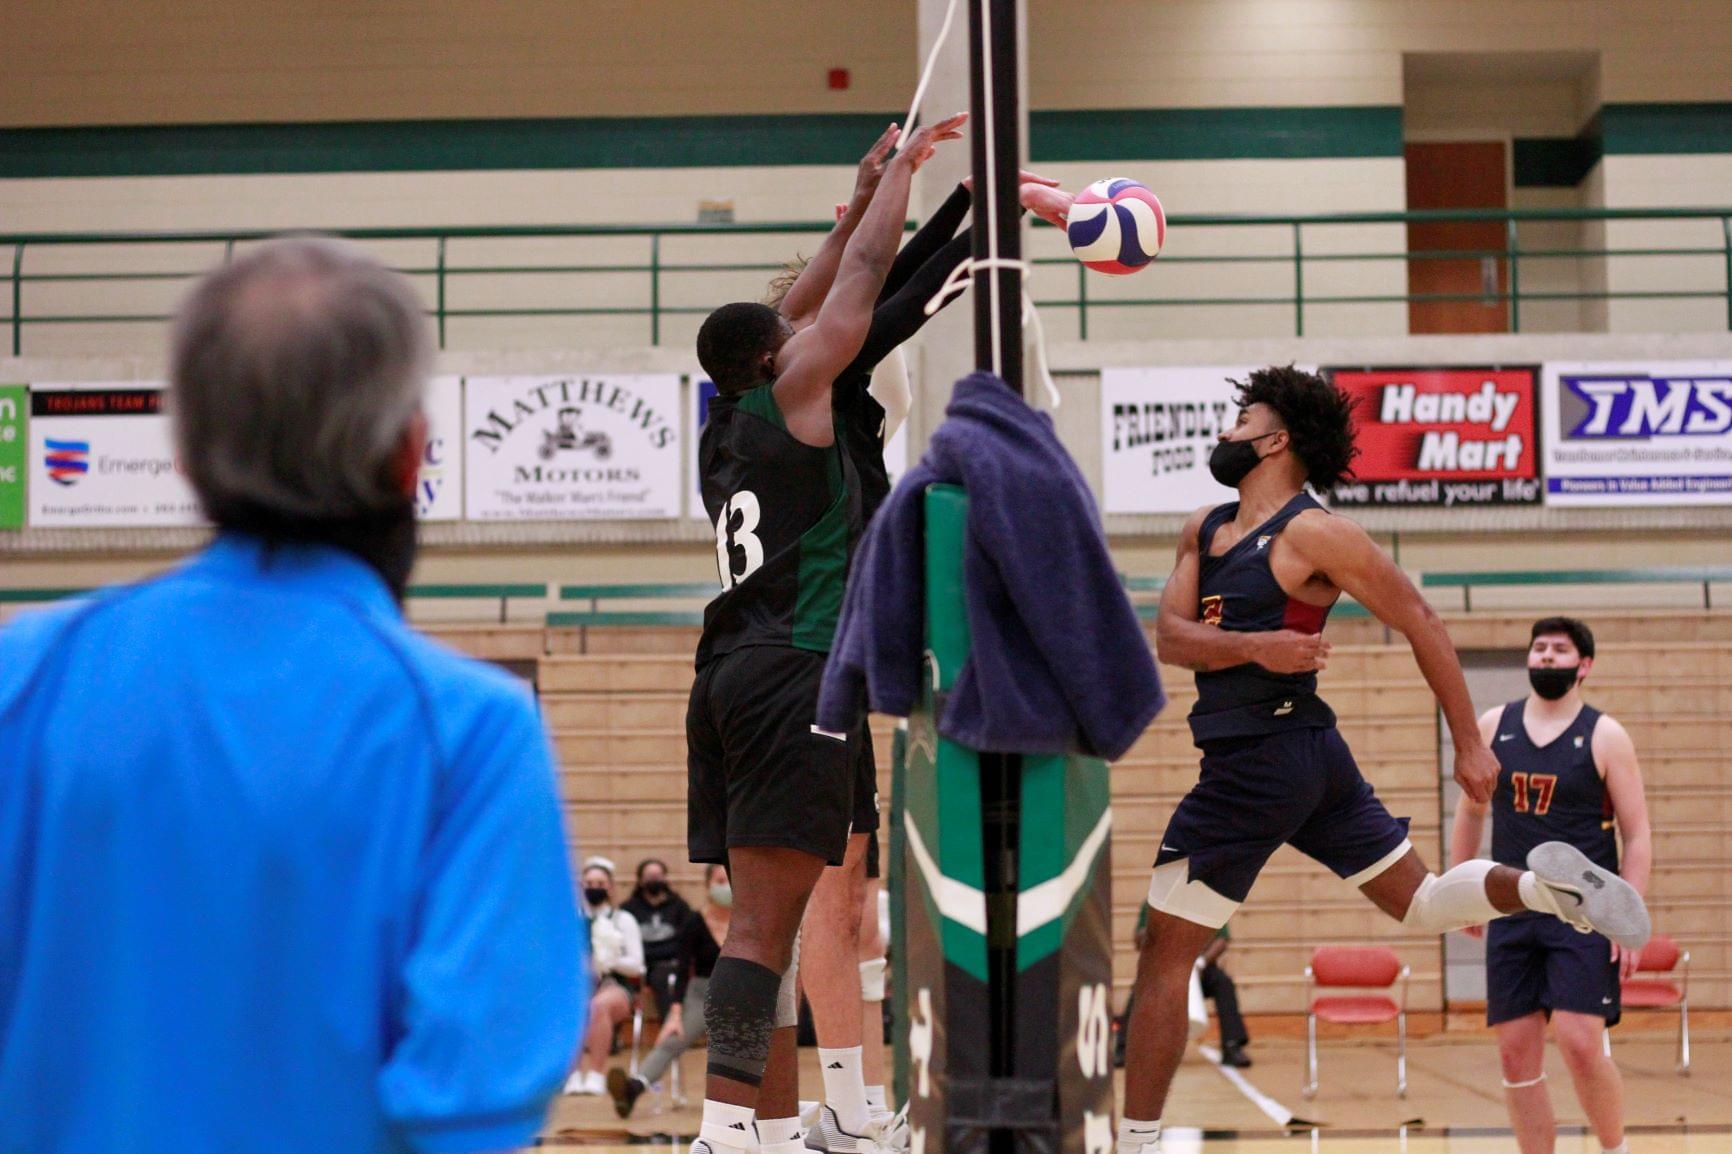 Men's Volleyball: Emmanuel College Vs. UMO (PHOTO GALLERY)